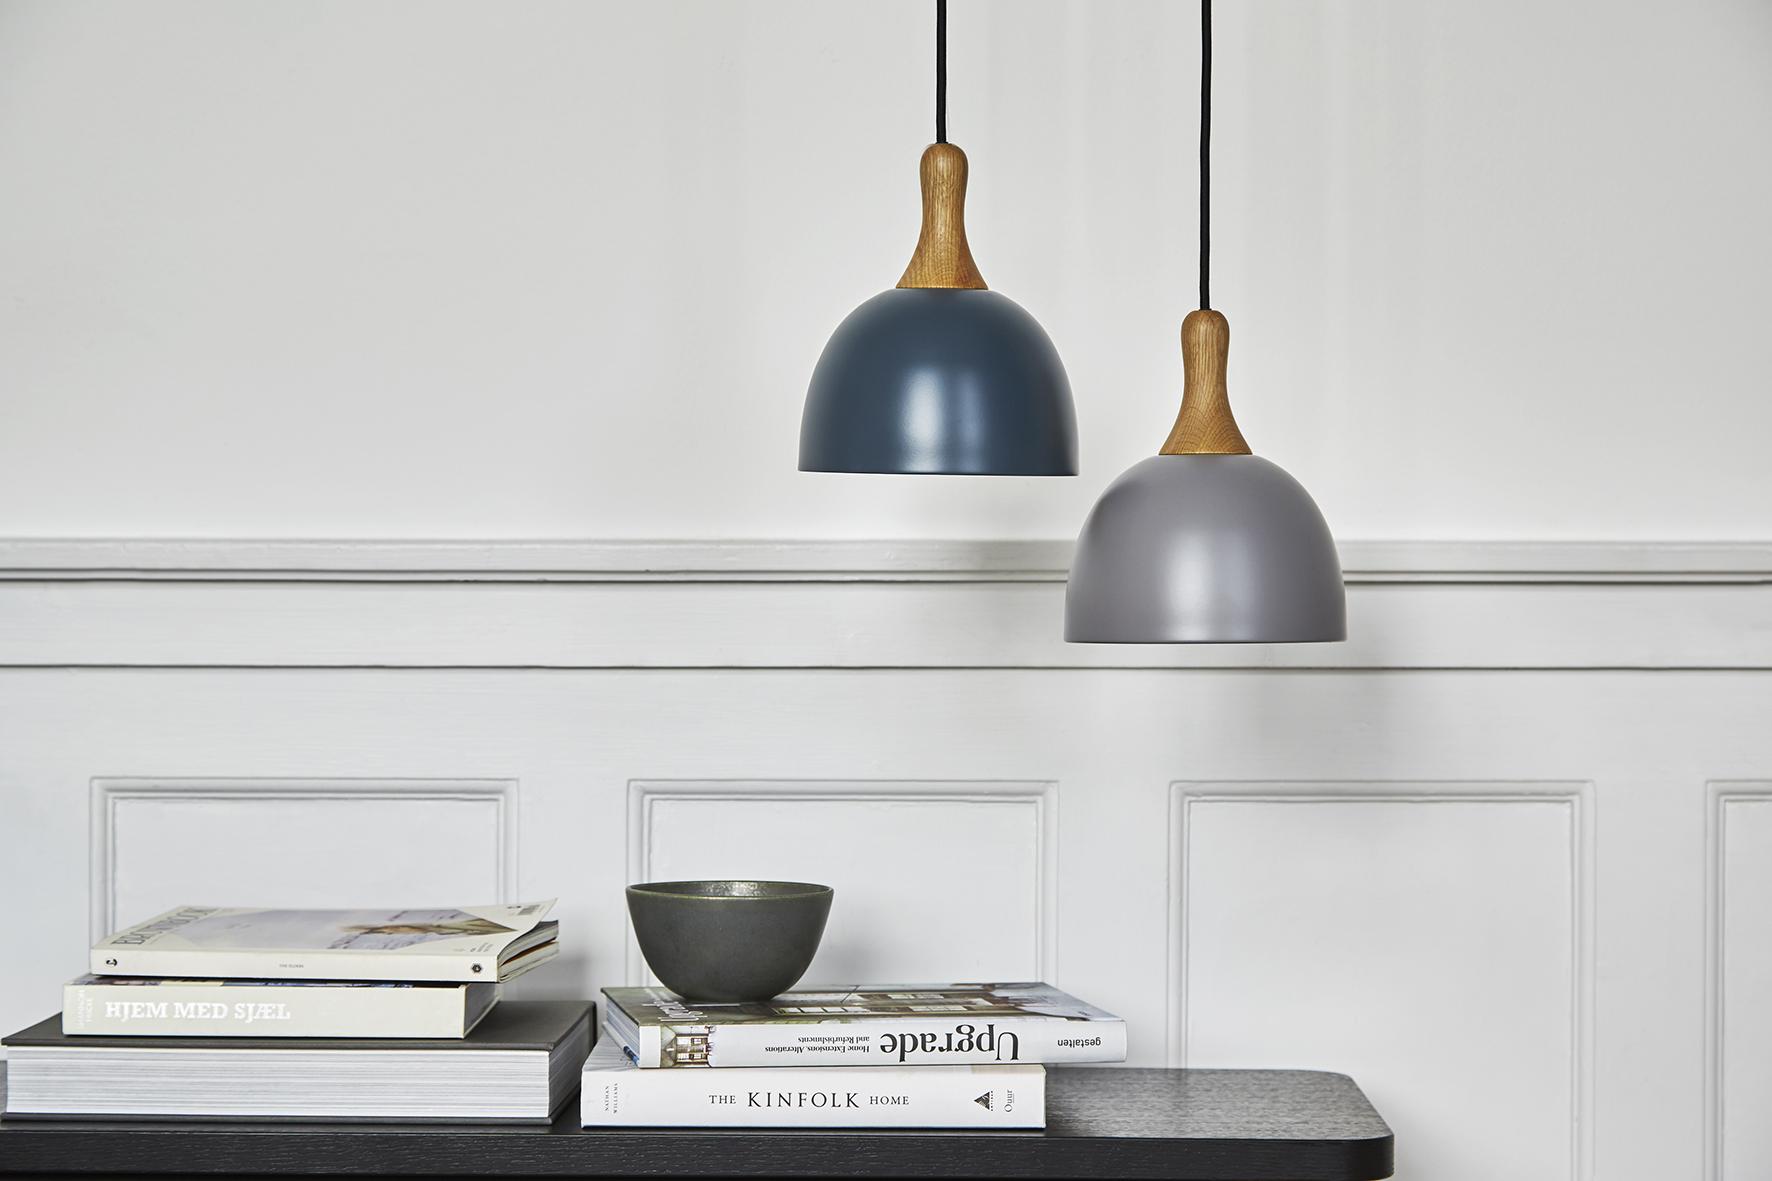 Topp pendant 28 cm blue + grey matt oak fixture - lifestyle Raadhusgade 1399+1546.jpg